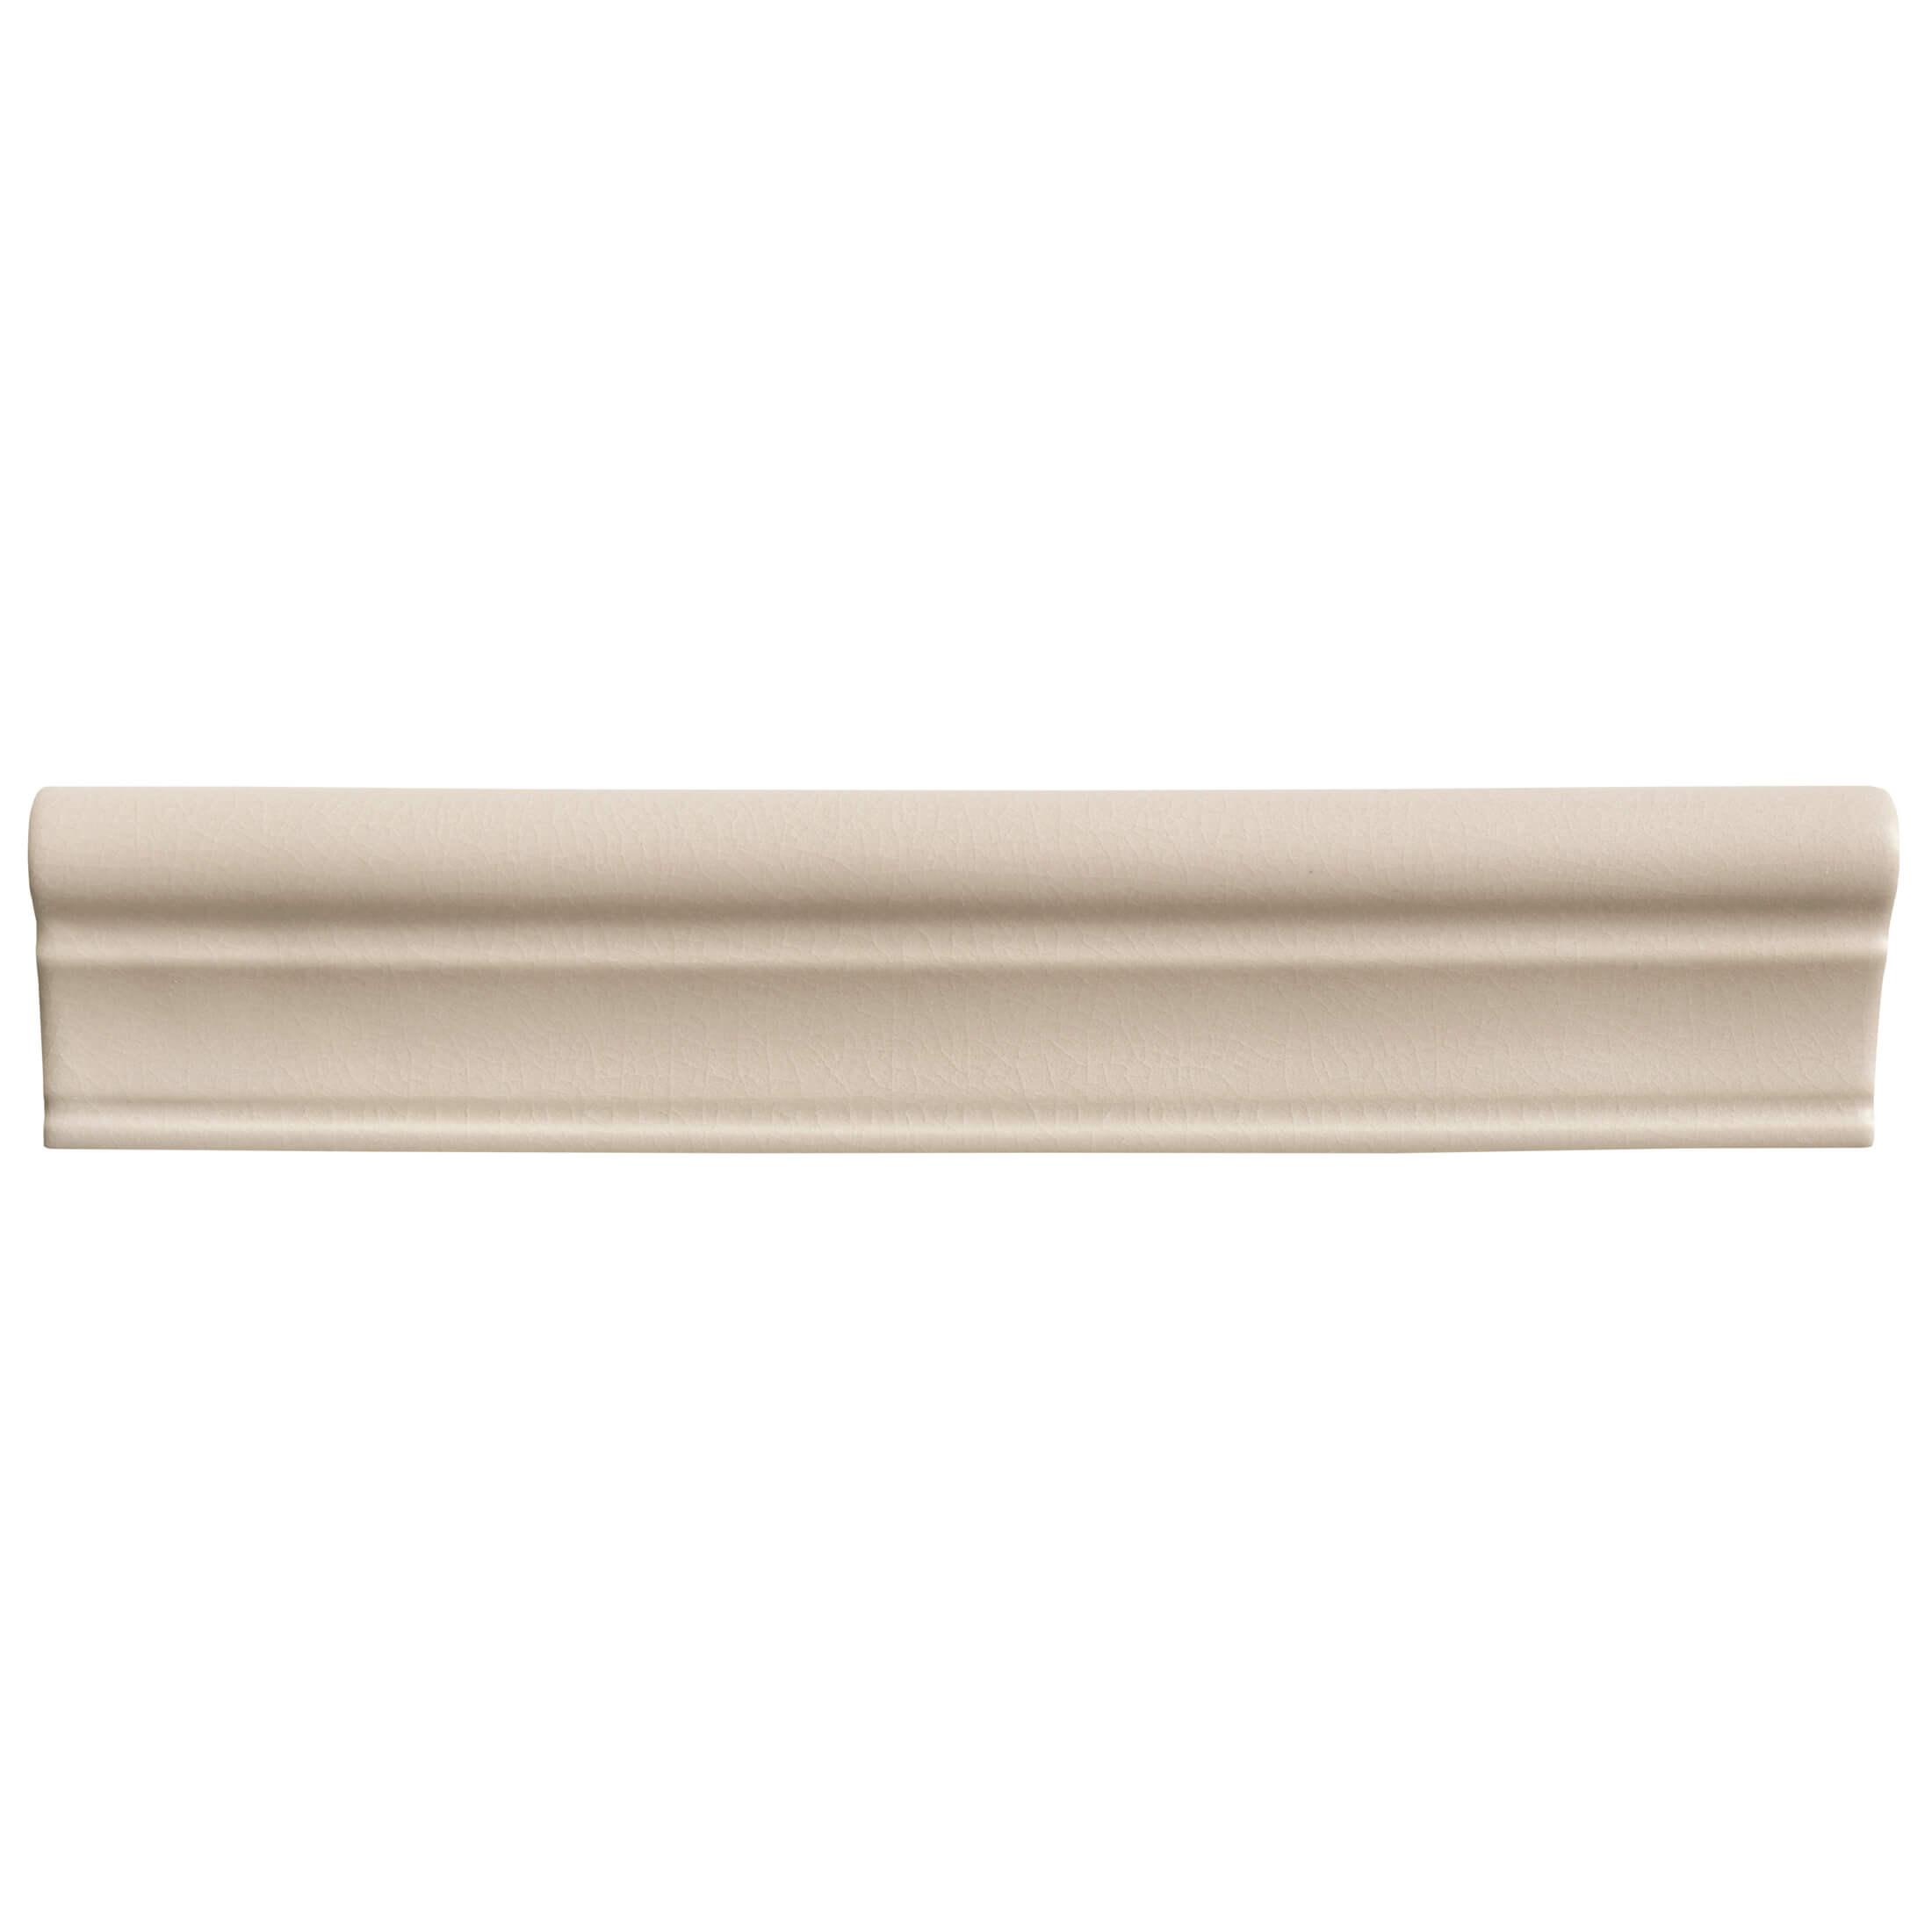 ADEH5021 - CORNISA  - 6 cm X 30 cm